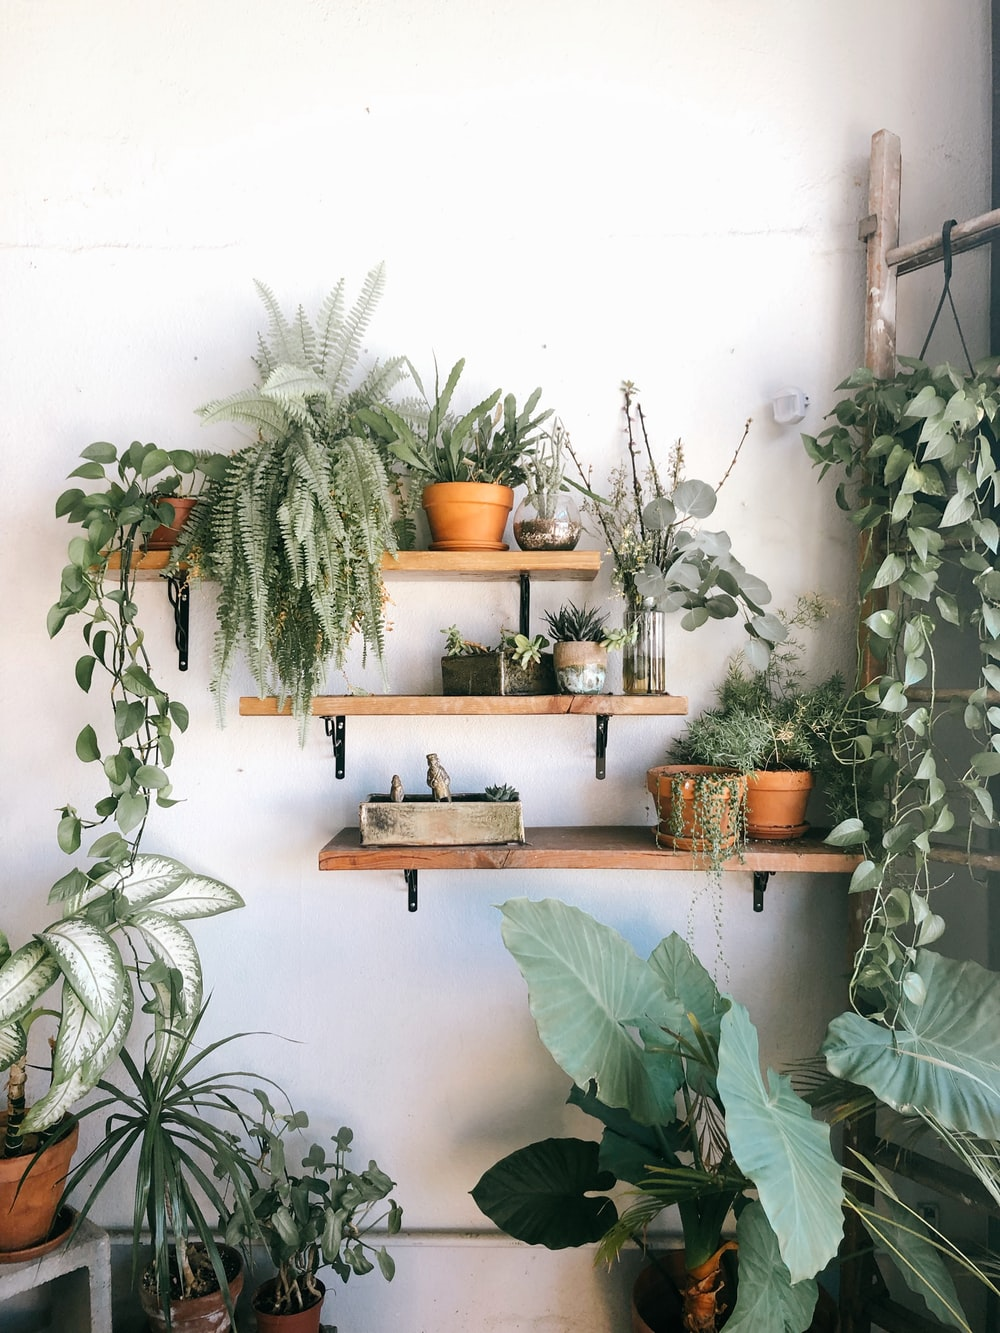 plants in pots on floating shelves